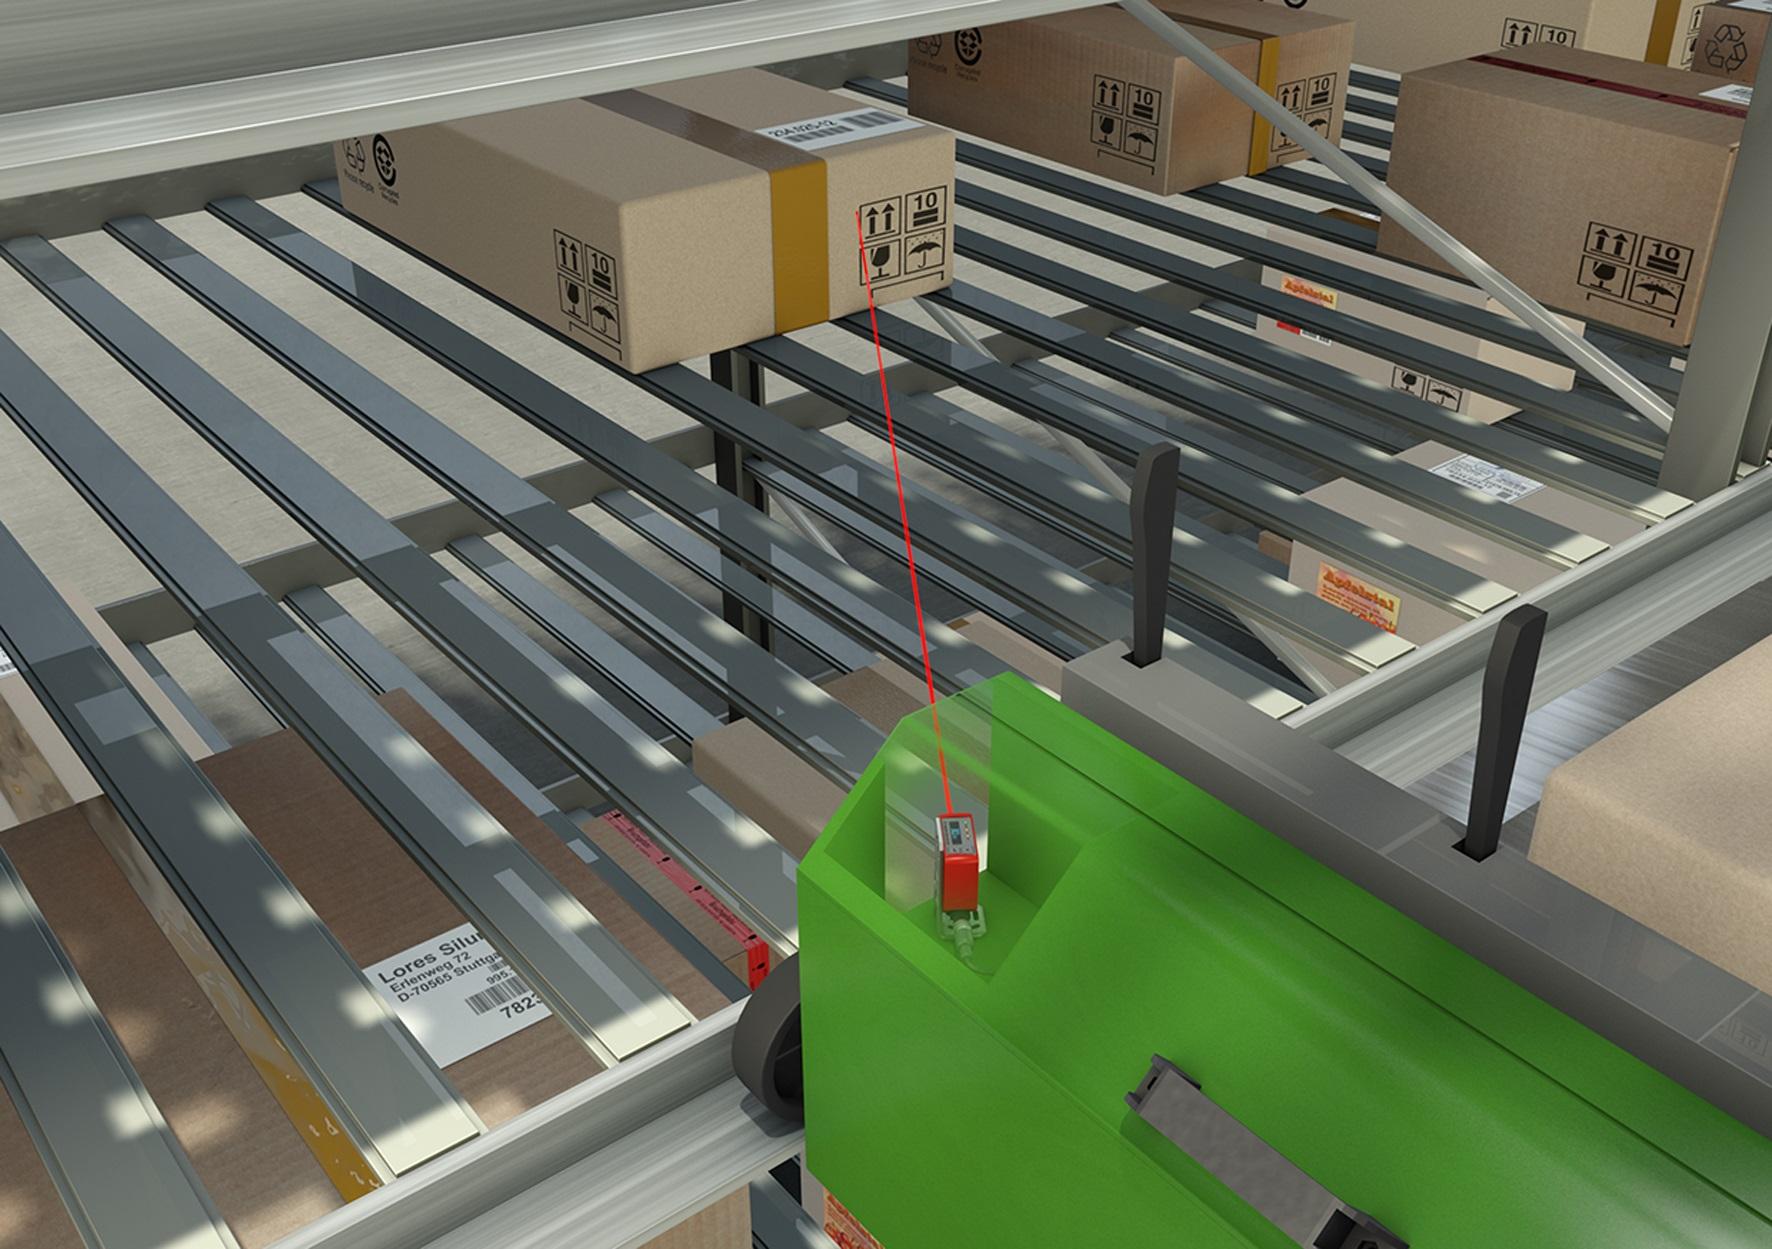 Control de compartimentos ocupados con profundidad múltiple | Foto: Leuze electronic